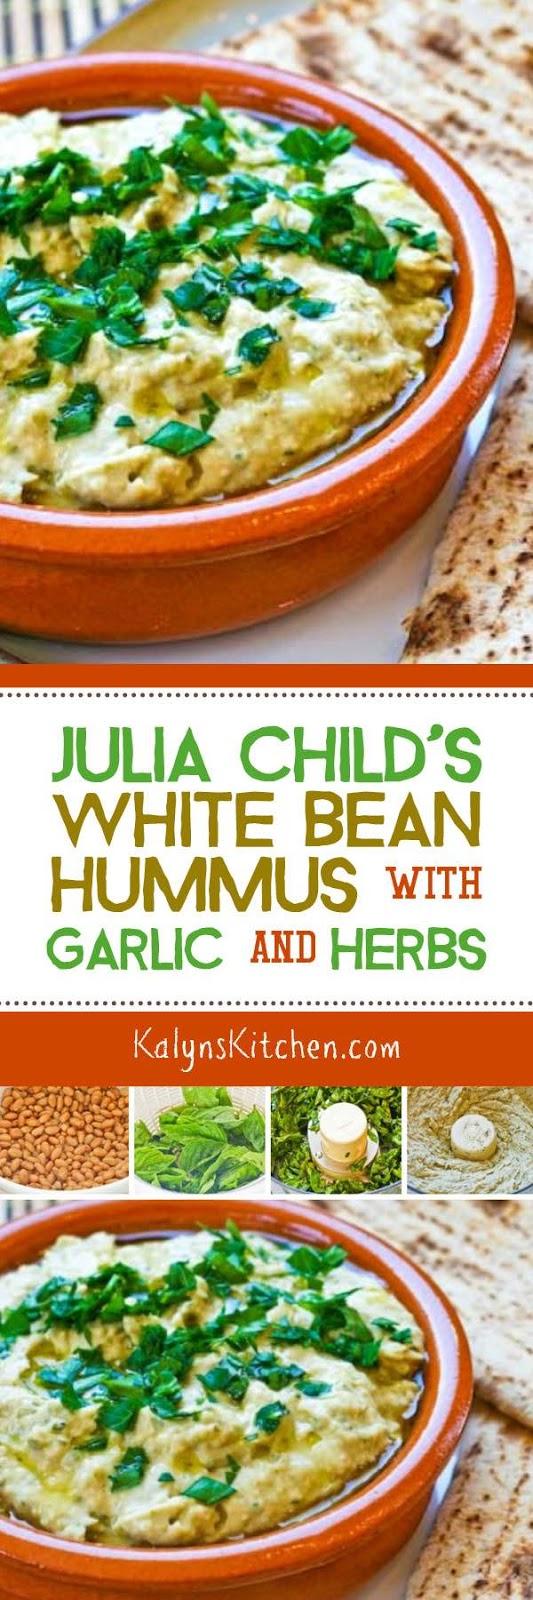 Julia Child's Brandade á la Soissonaise (White Bean Hummus ...